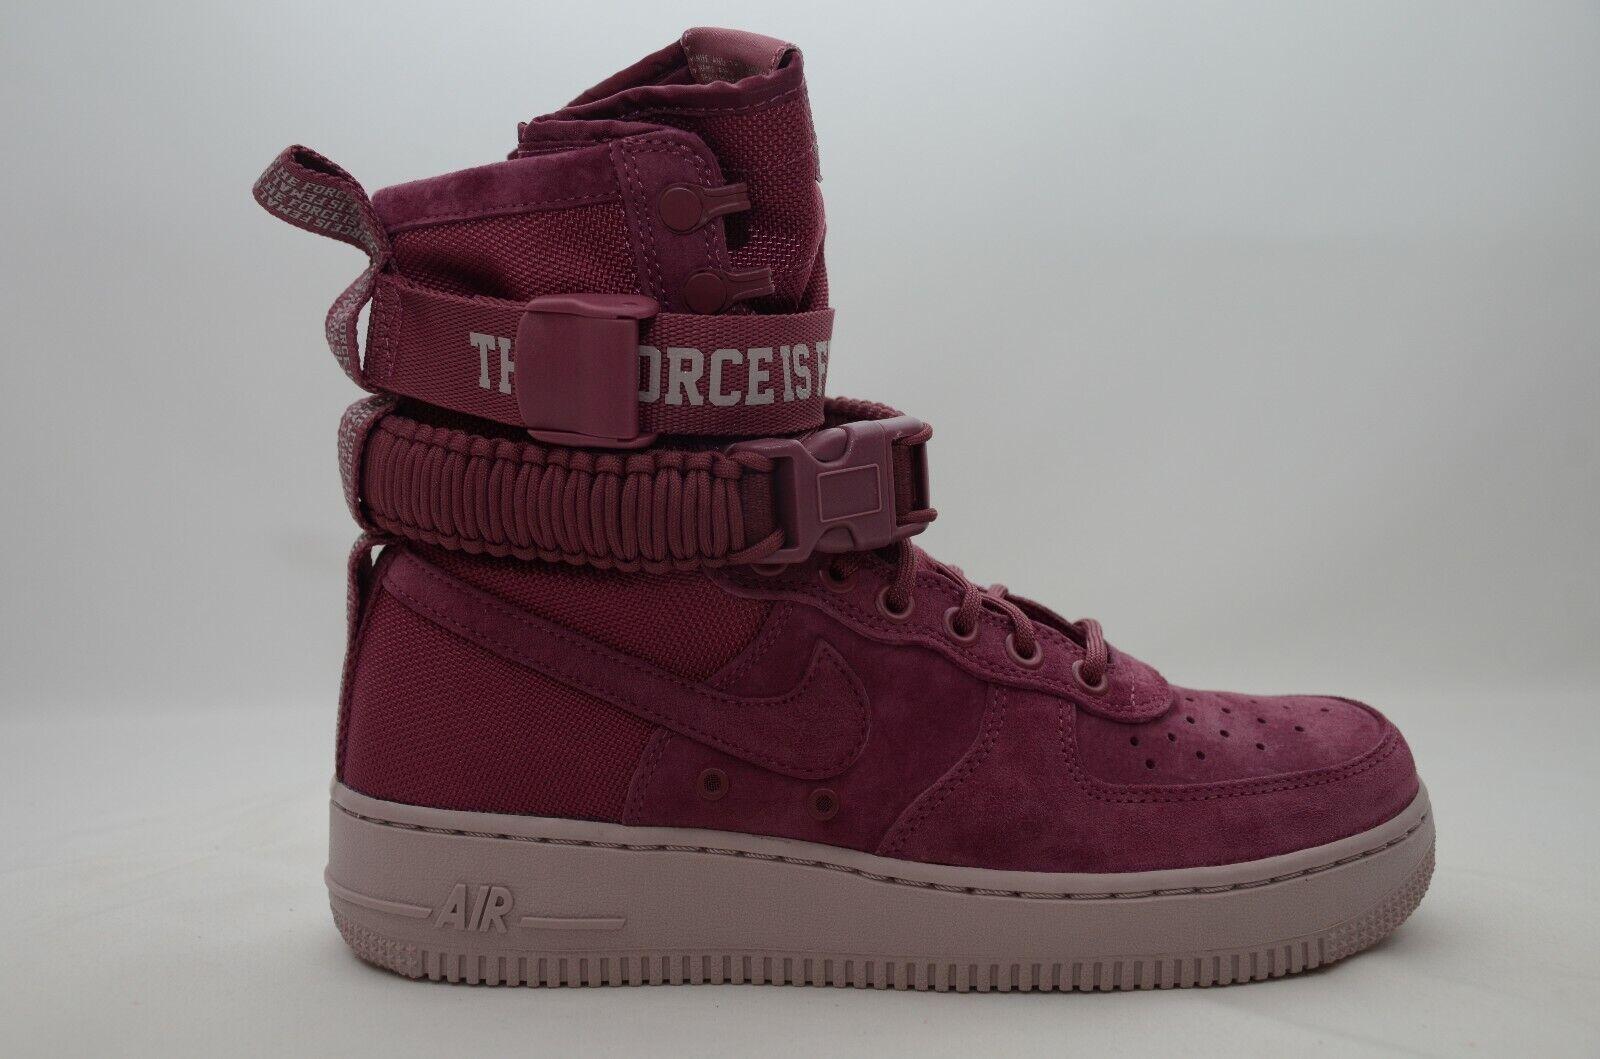 b2827614efa2a Nike Women's SF Air Force 1 FIF Shoes Vintage Wine Aj1700-600 B 8.5 ...